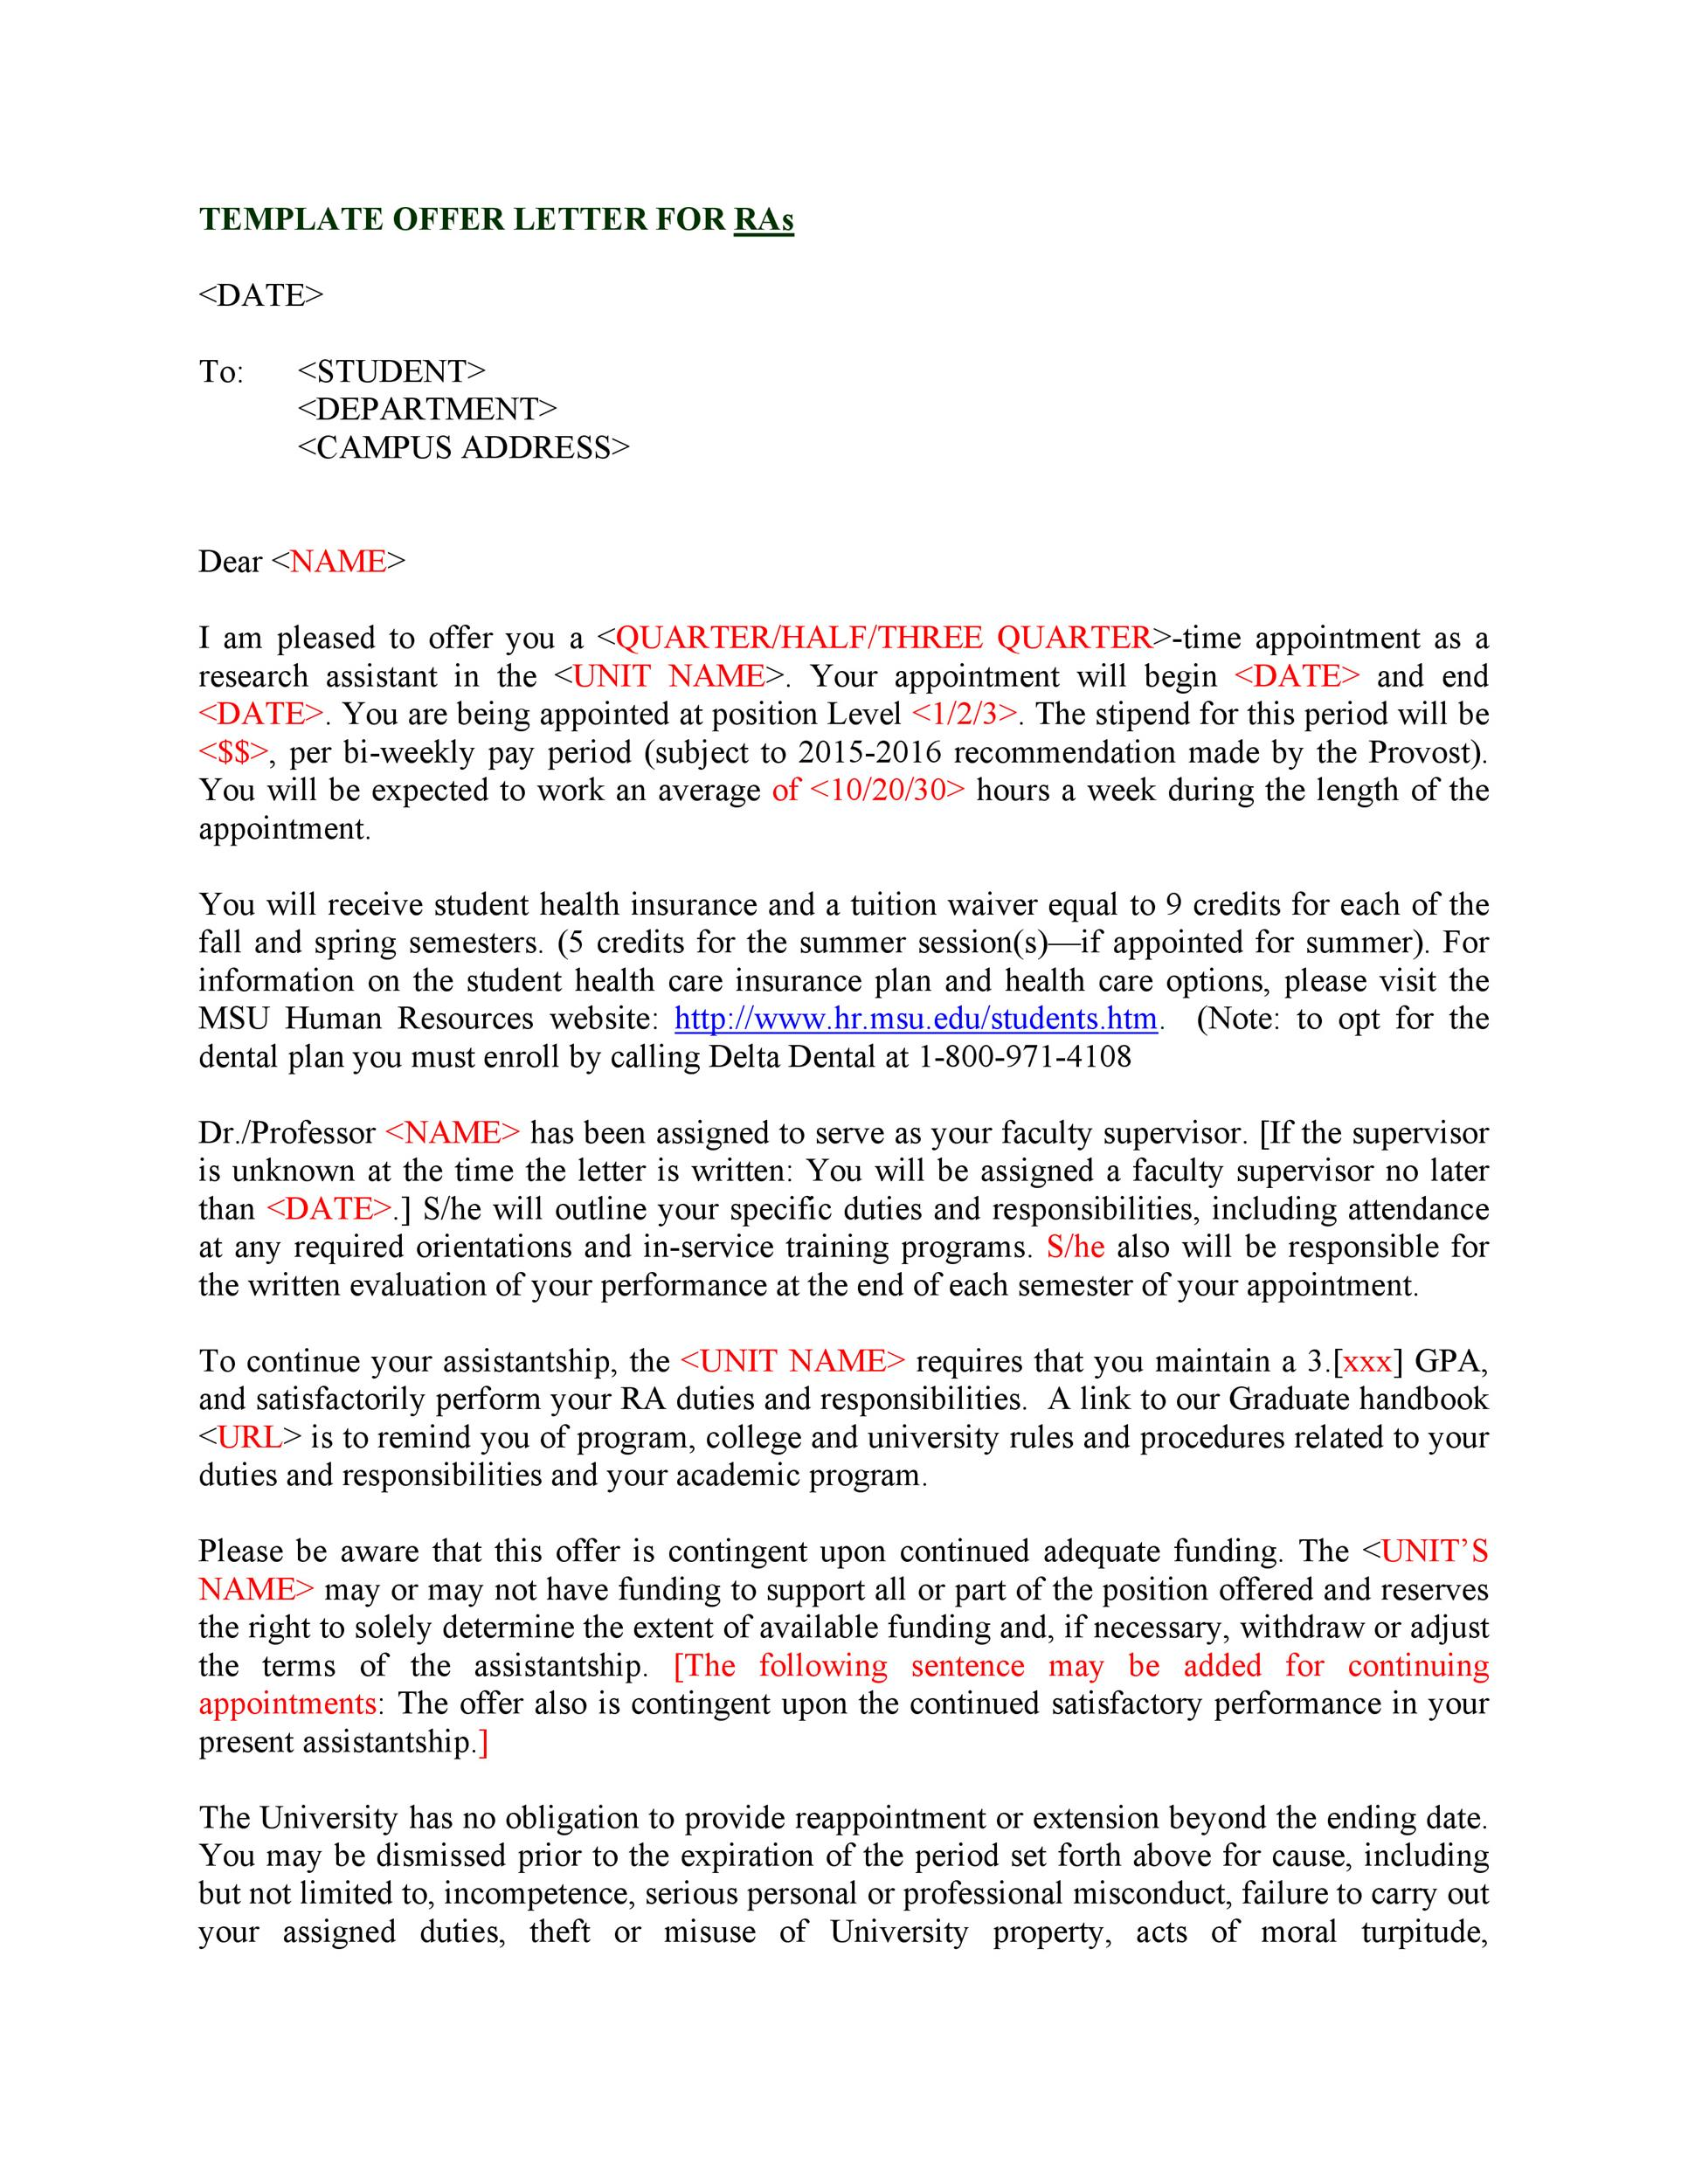 Free Offer letter 21